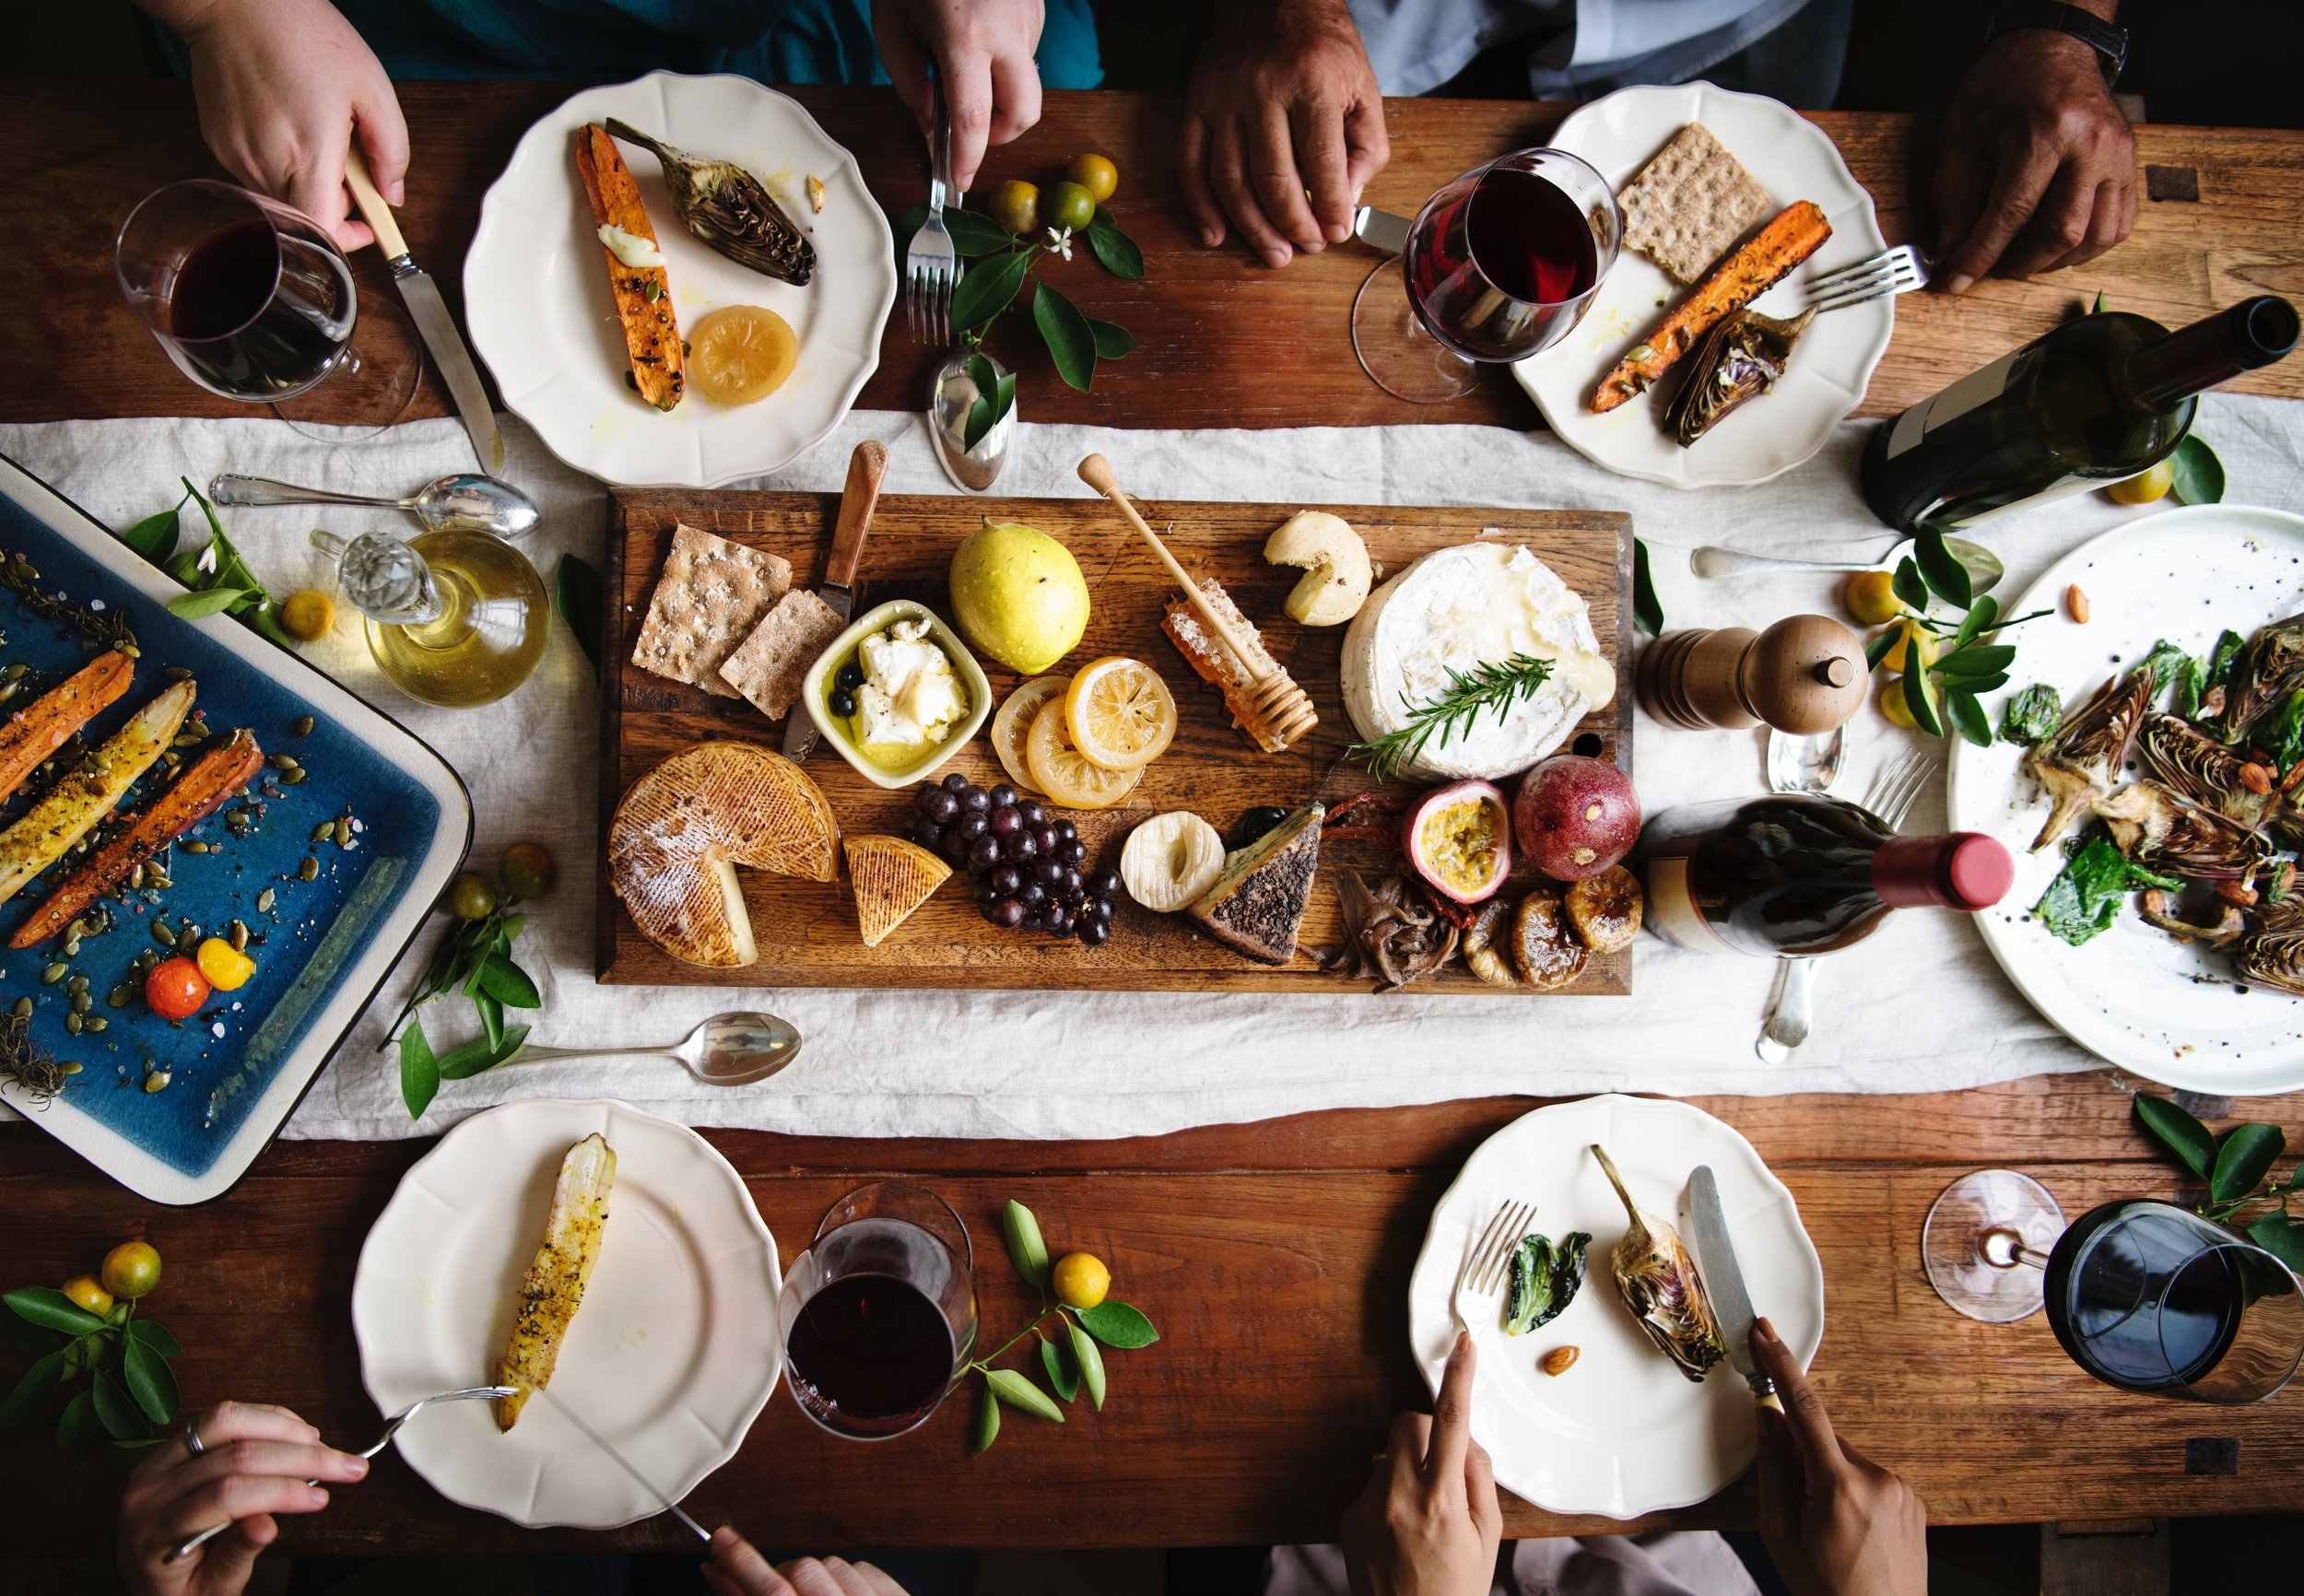 bread-cheese-cheese-platter-1893609.jpg